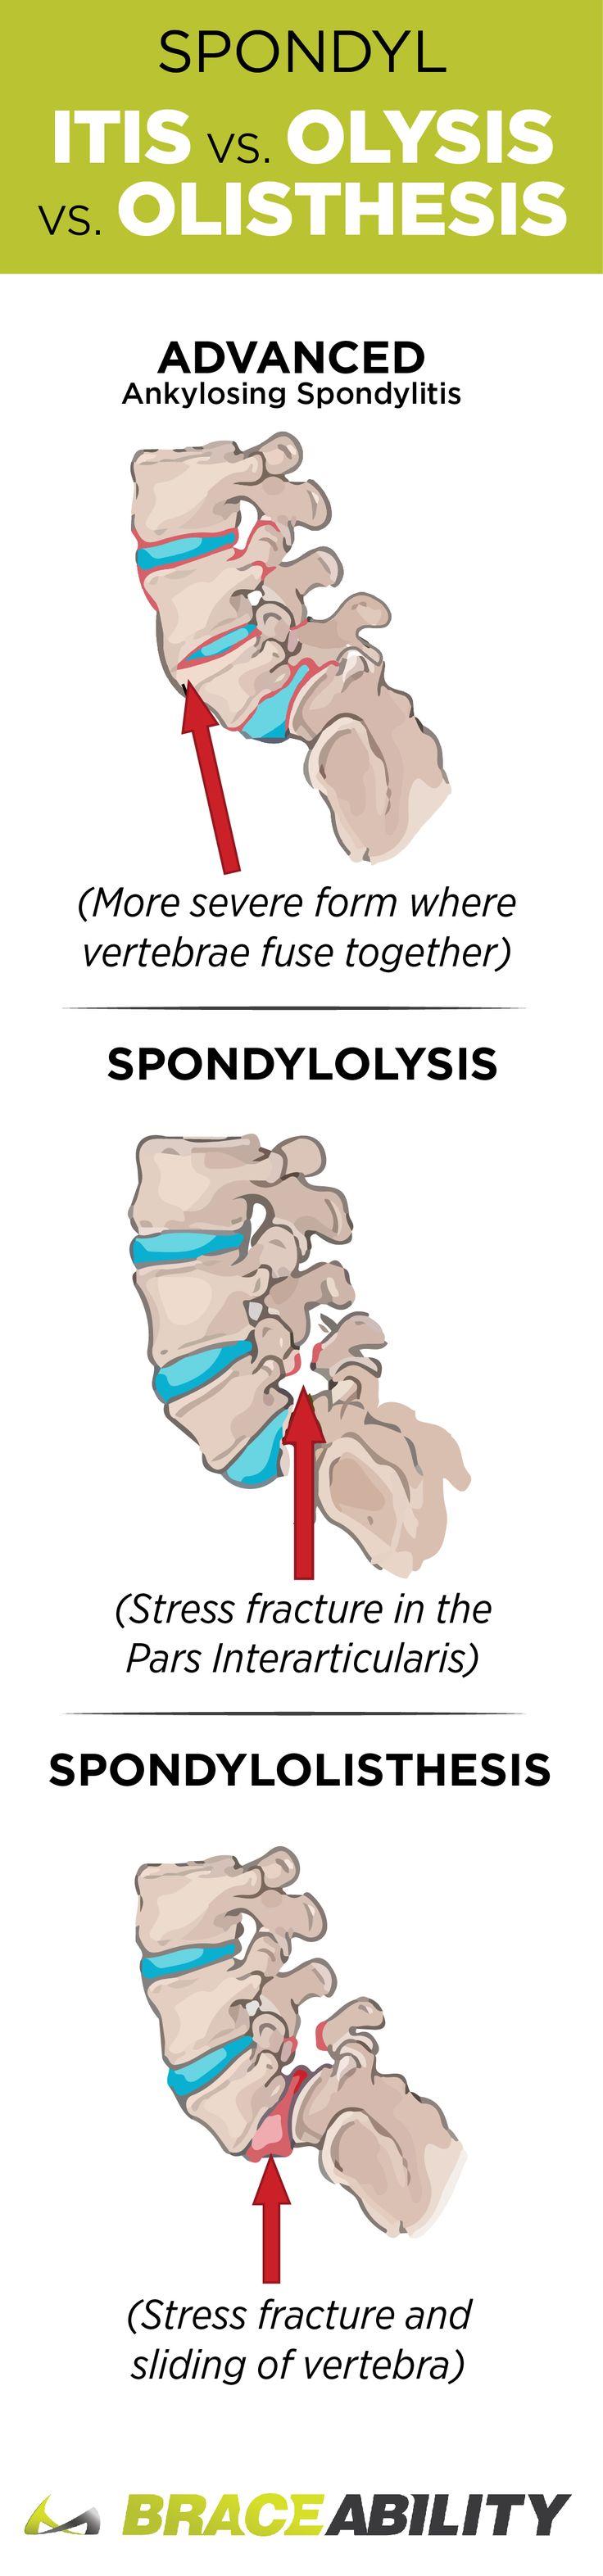 what is spondylolysis and spondylolisthesis